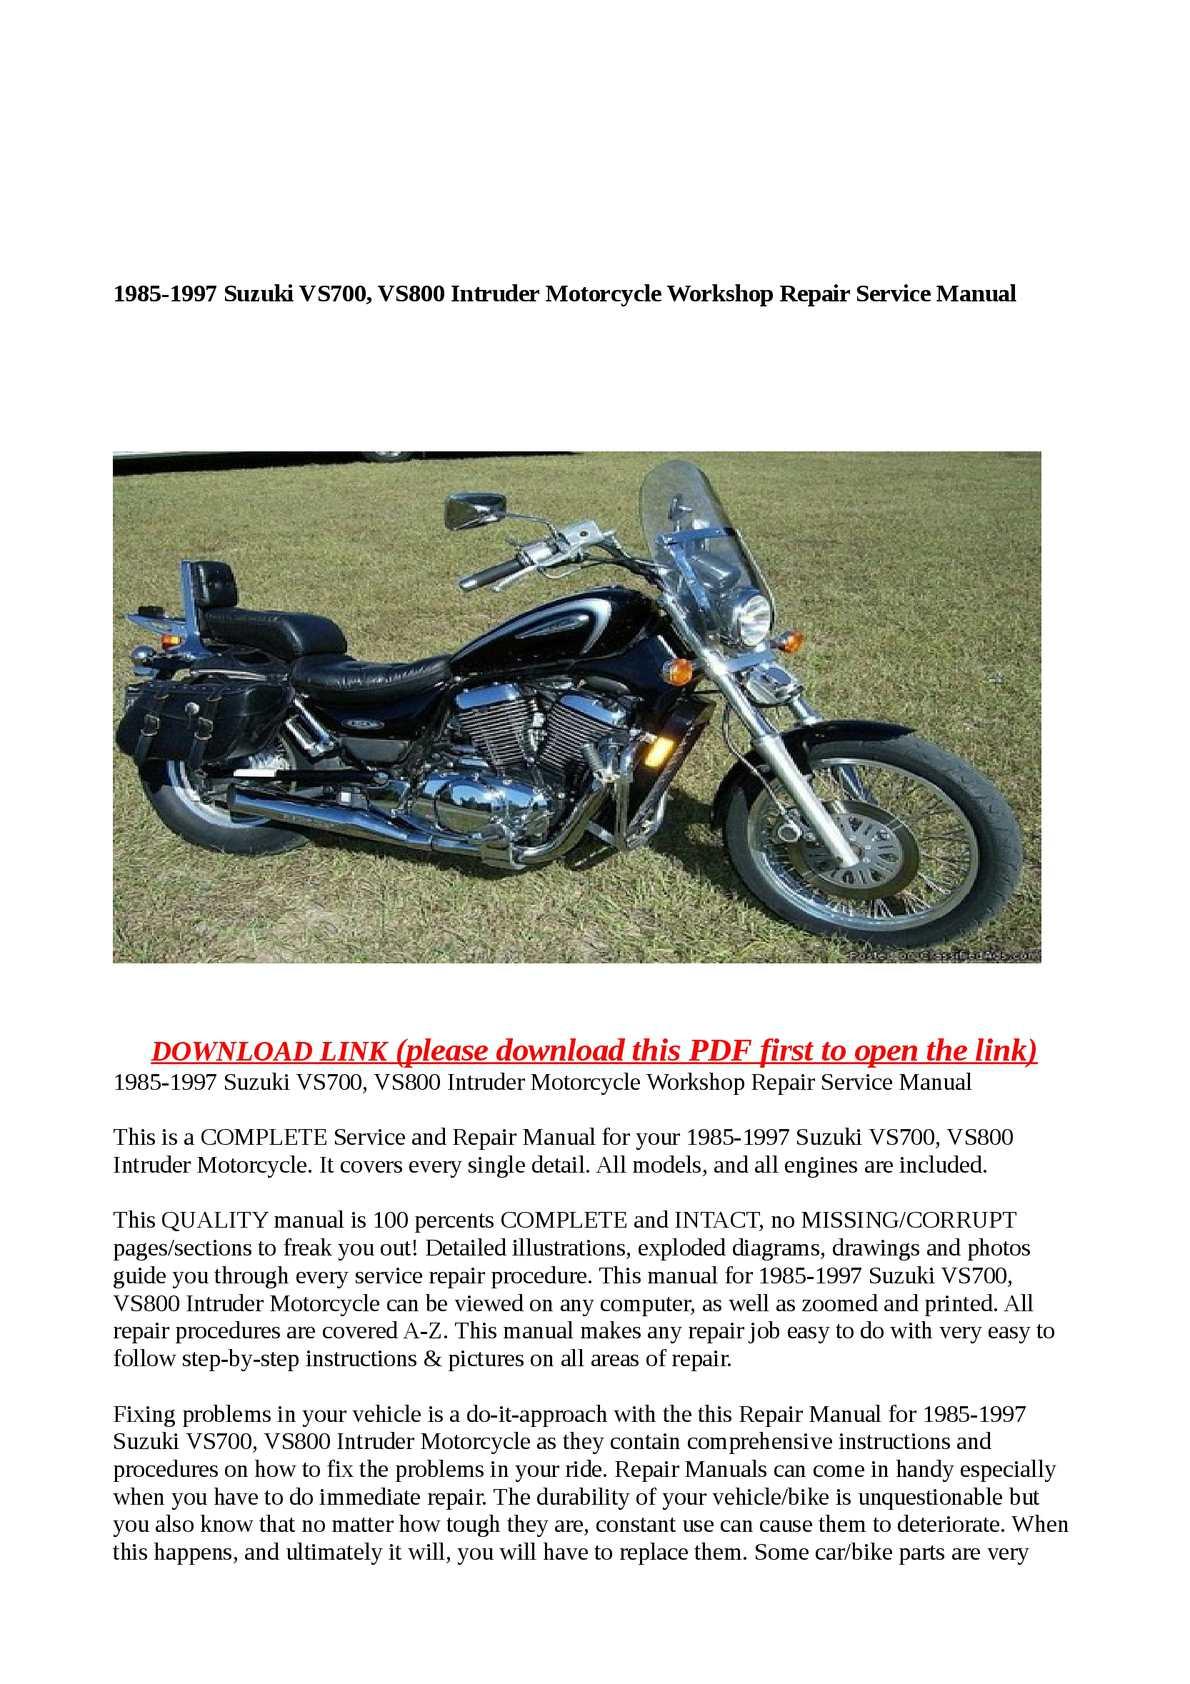 Calaméo - 1985-1997 Suzuki VS700, VS800 Intruder Motorcycle Workshop Repair  Service Manual